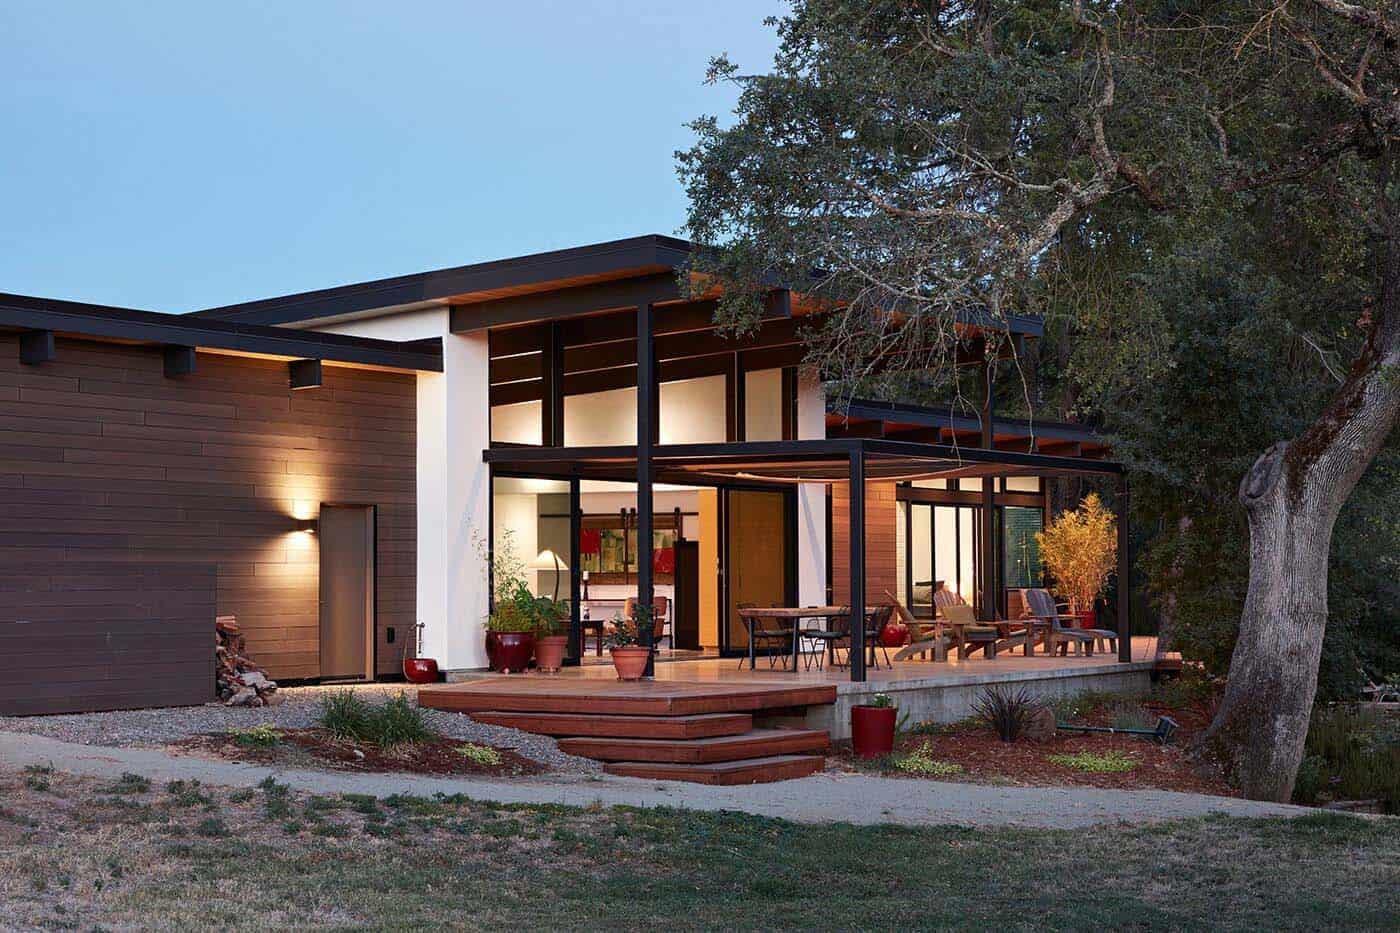 Sacramento Modern Residence-Klopf Architecture-19-1 Kindesign